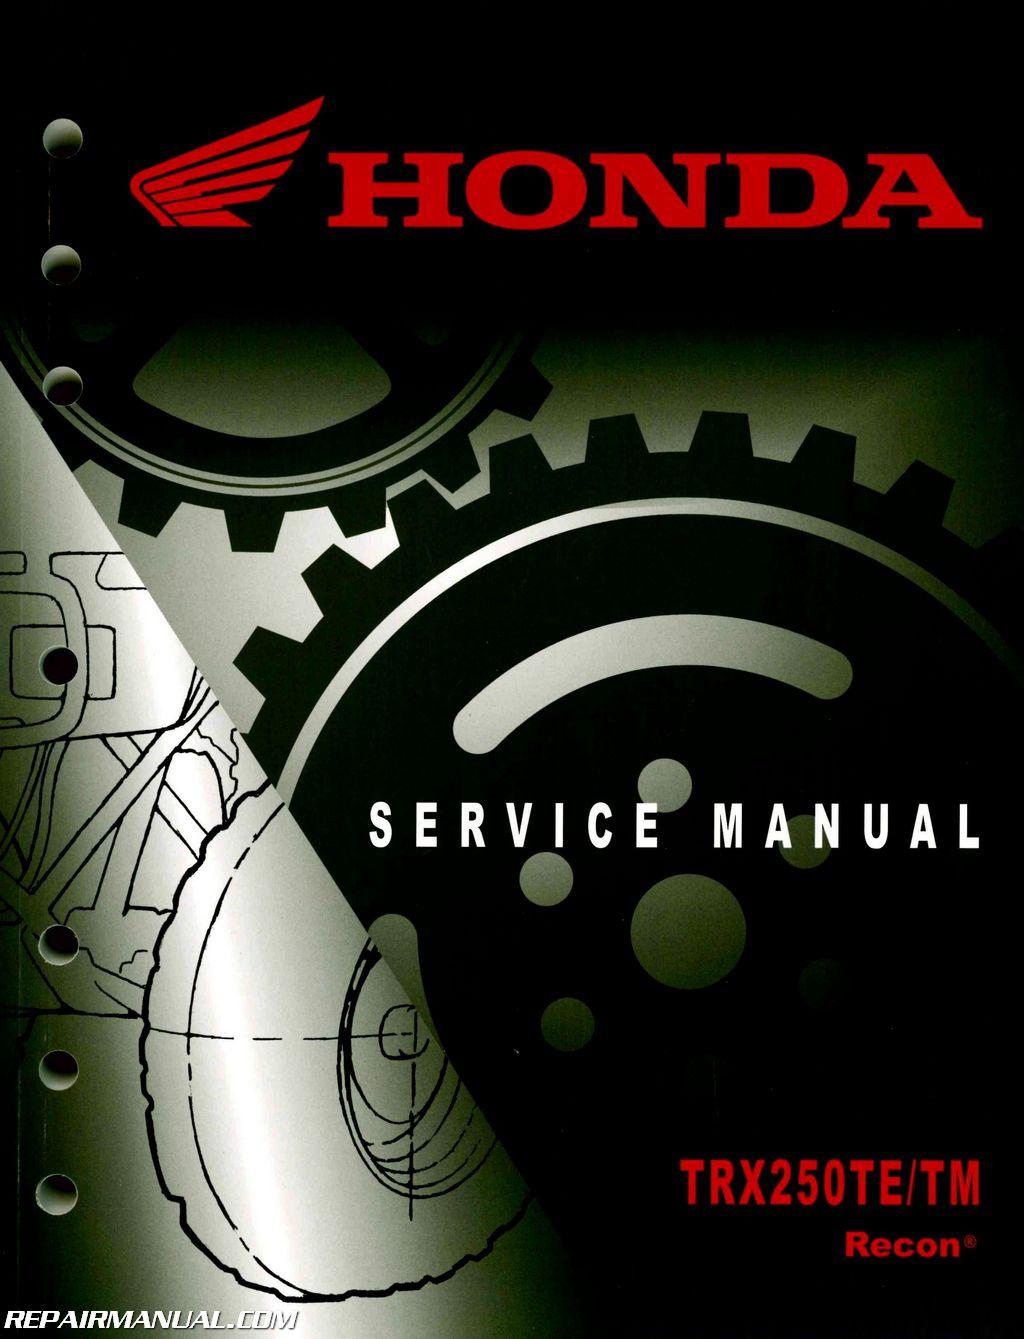 Terrific 2005 2019 Honda Trx250Te Tm Recon Atv Service Manual Wiring Cloud Licukshollocom